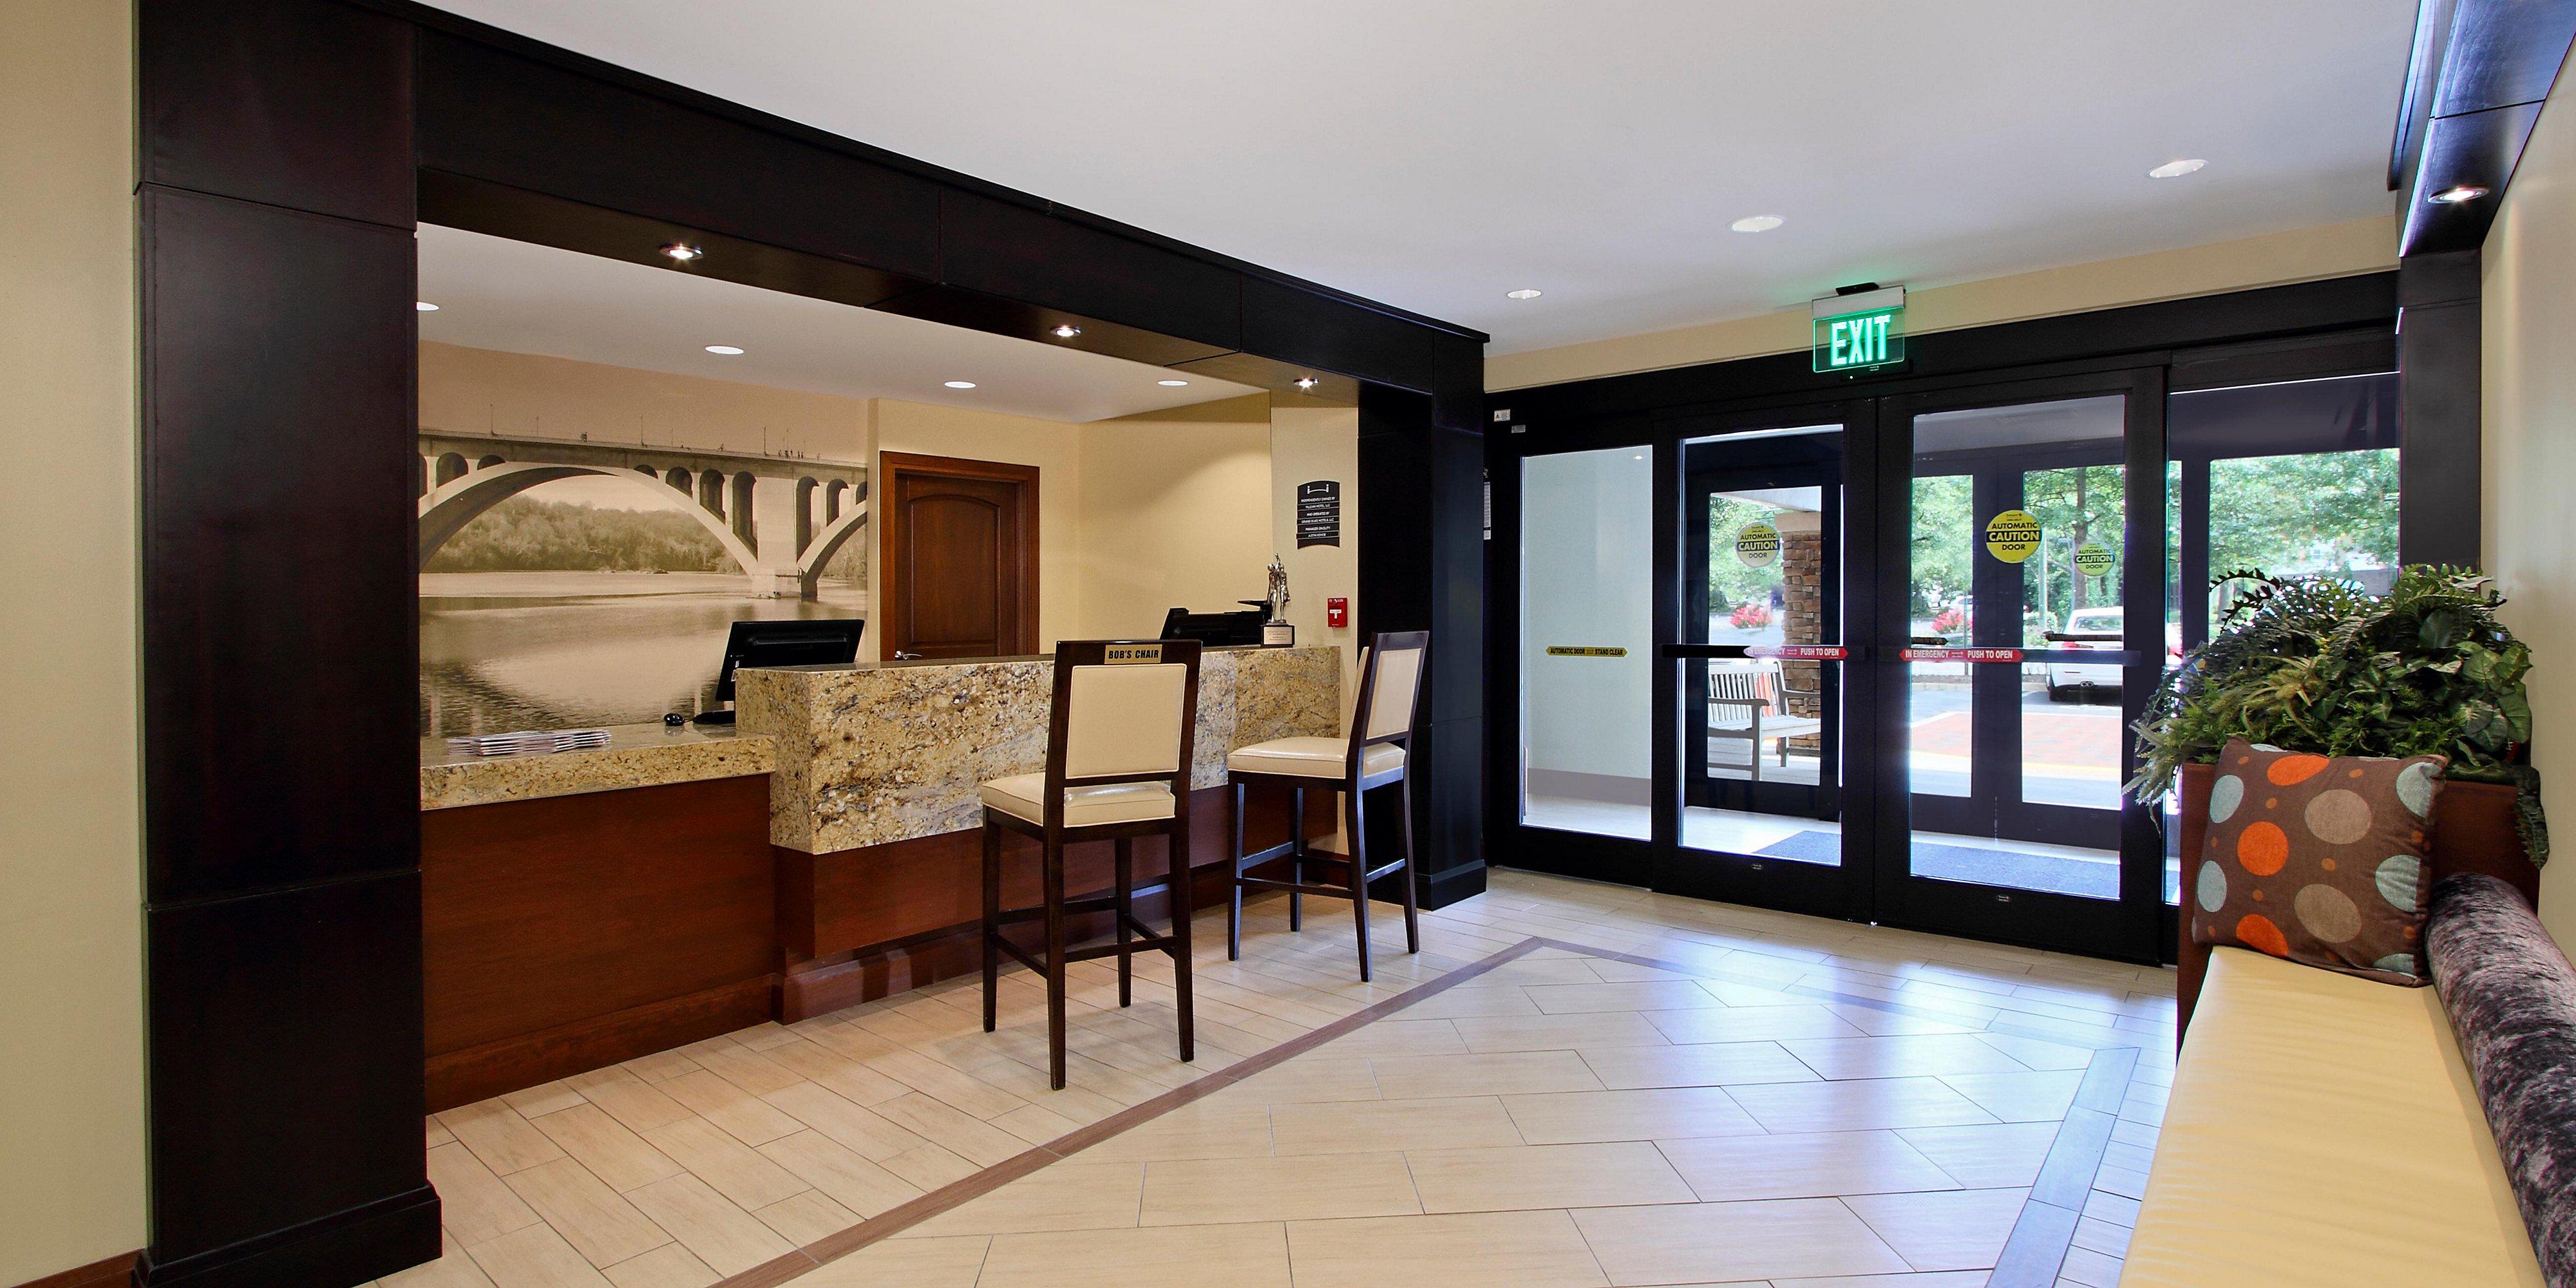 Extended Stay Hotels in Mclean, VA | Staybridge Suites